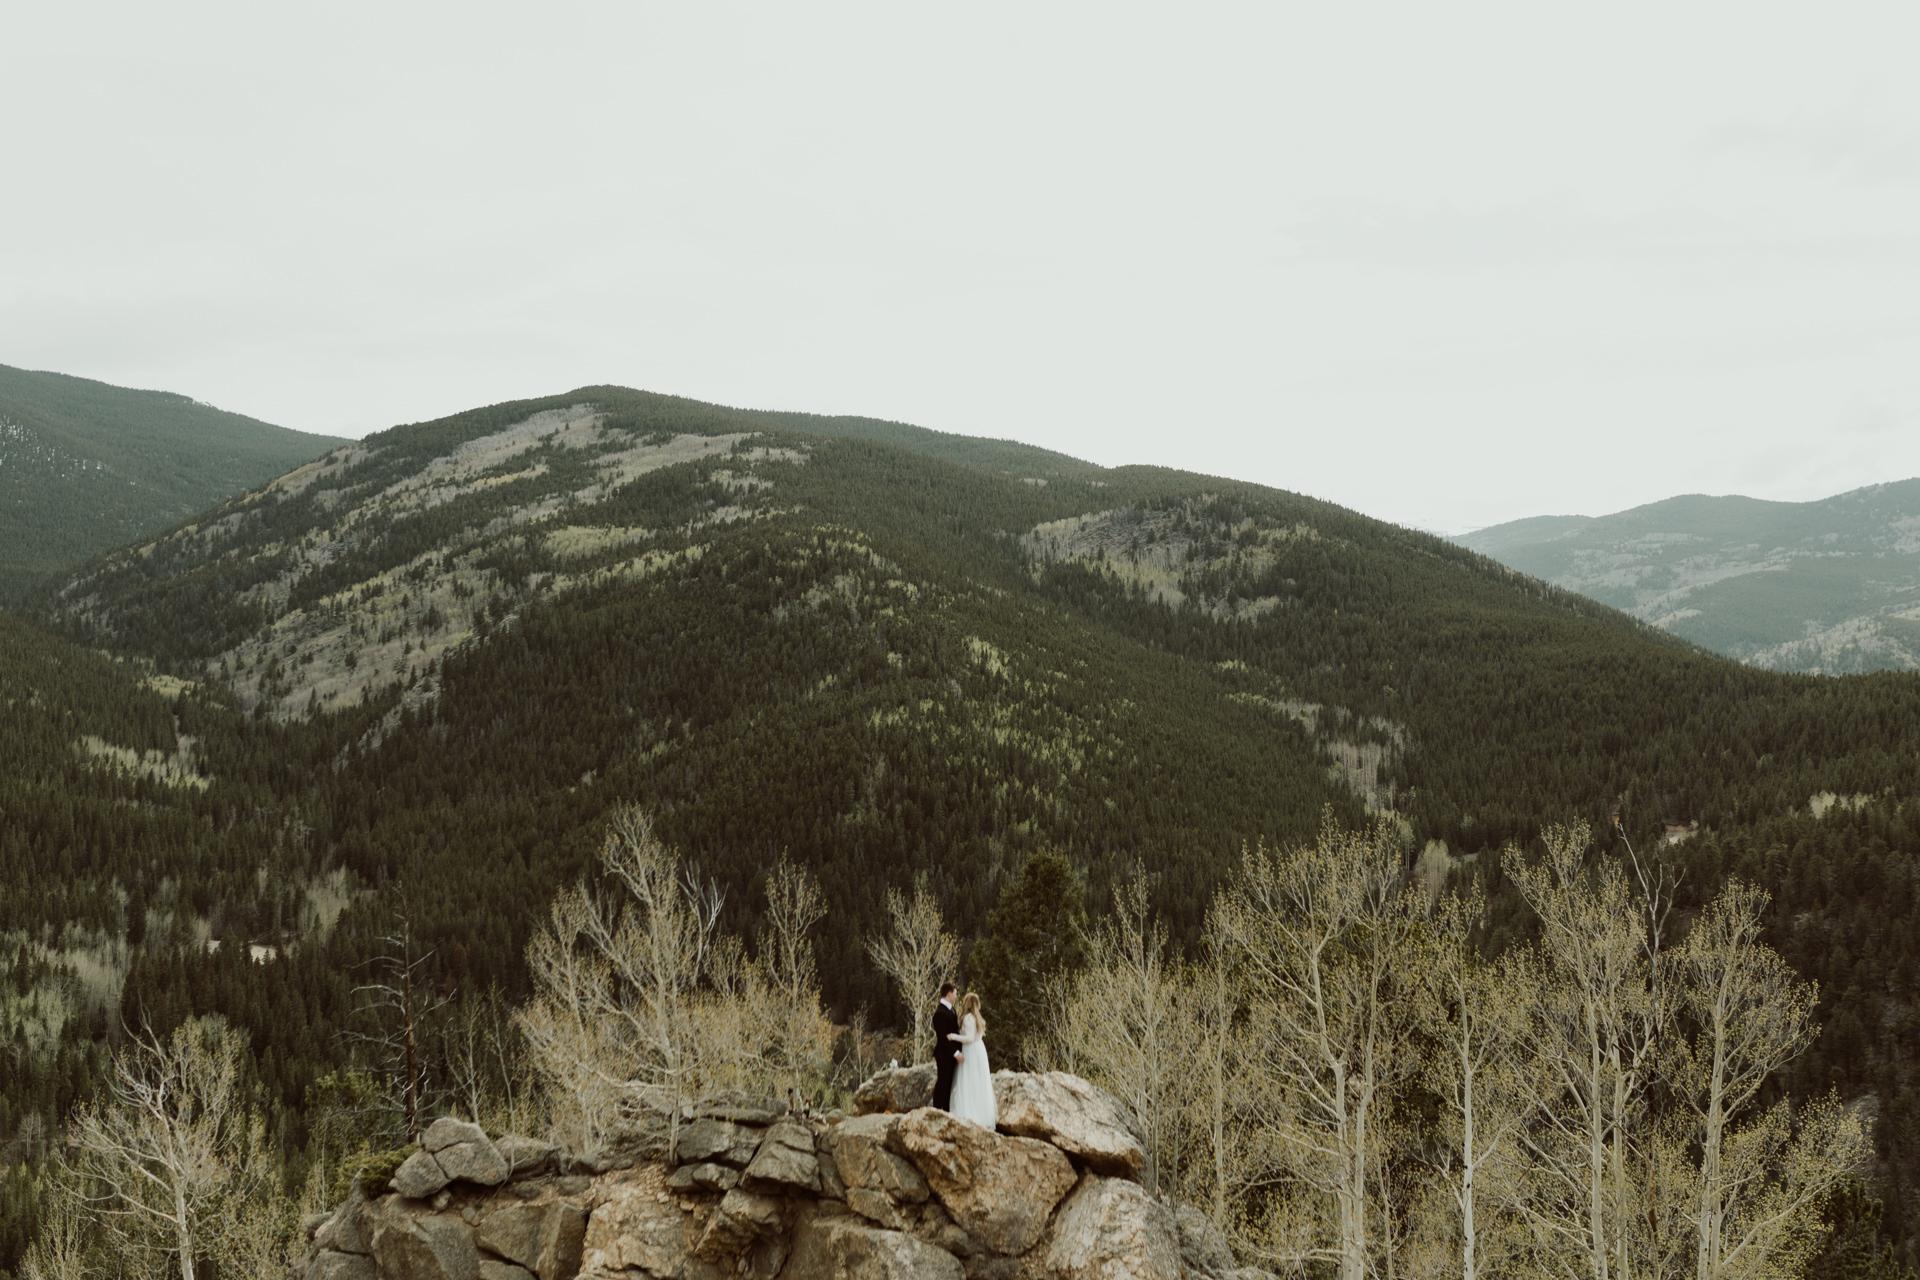 colorado-mount-evans-intimate-adventurous-elopement-16.jpg